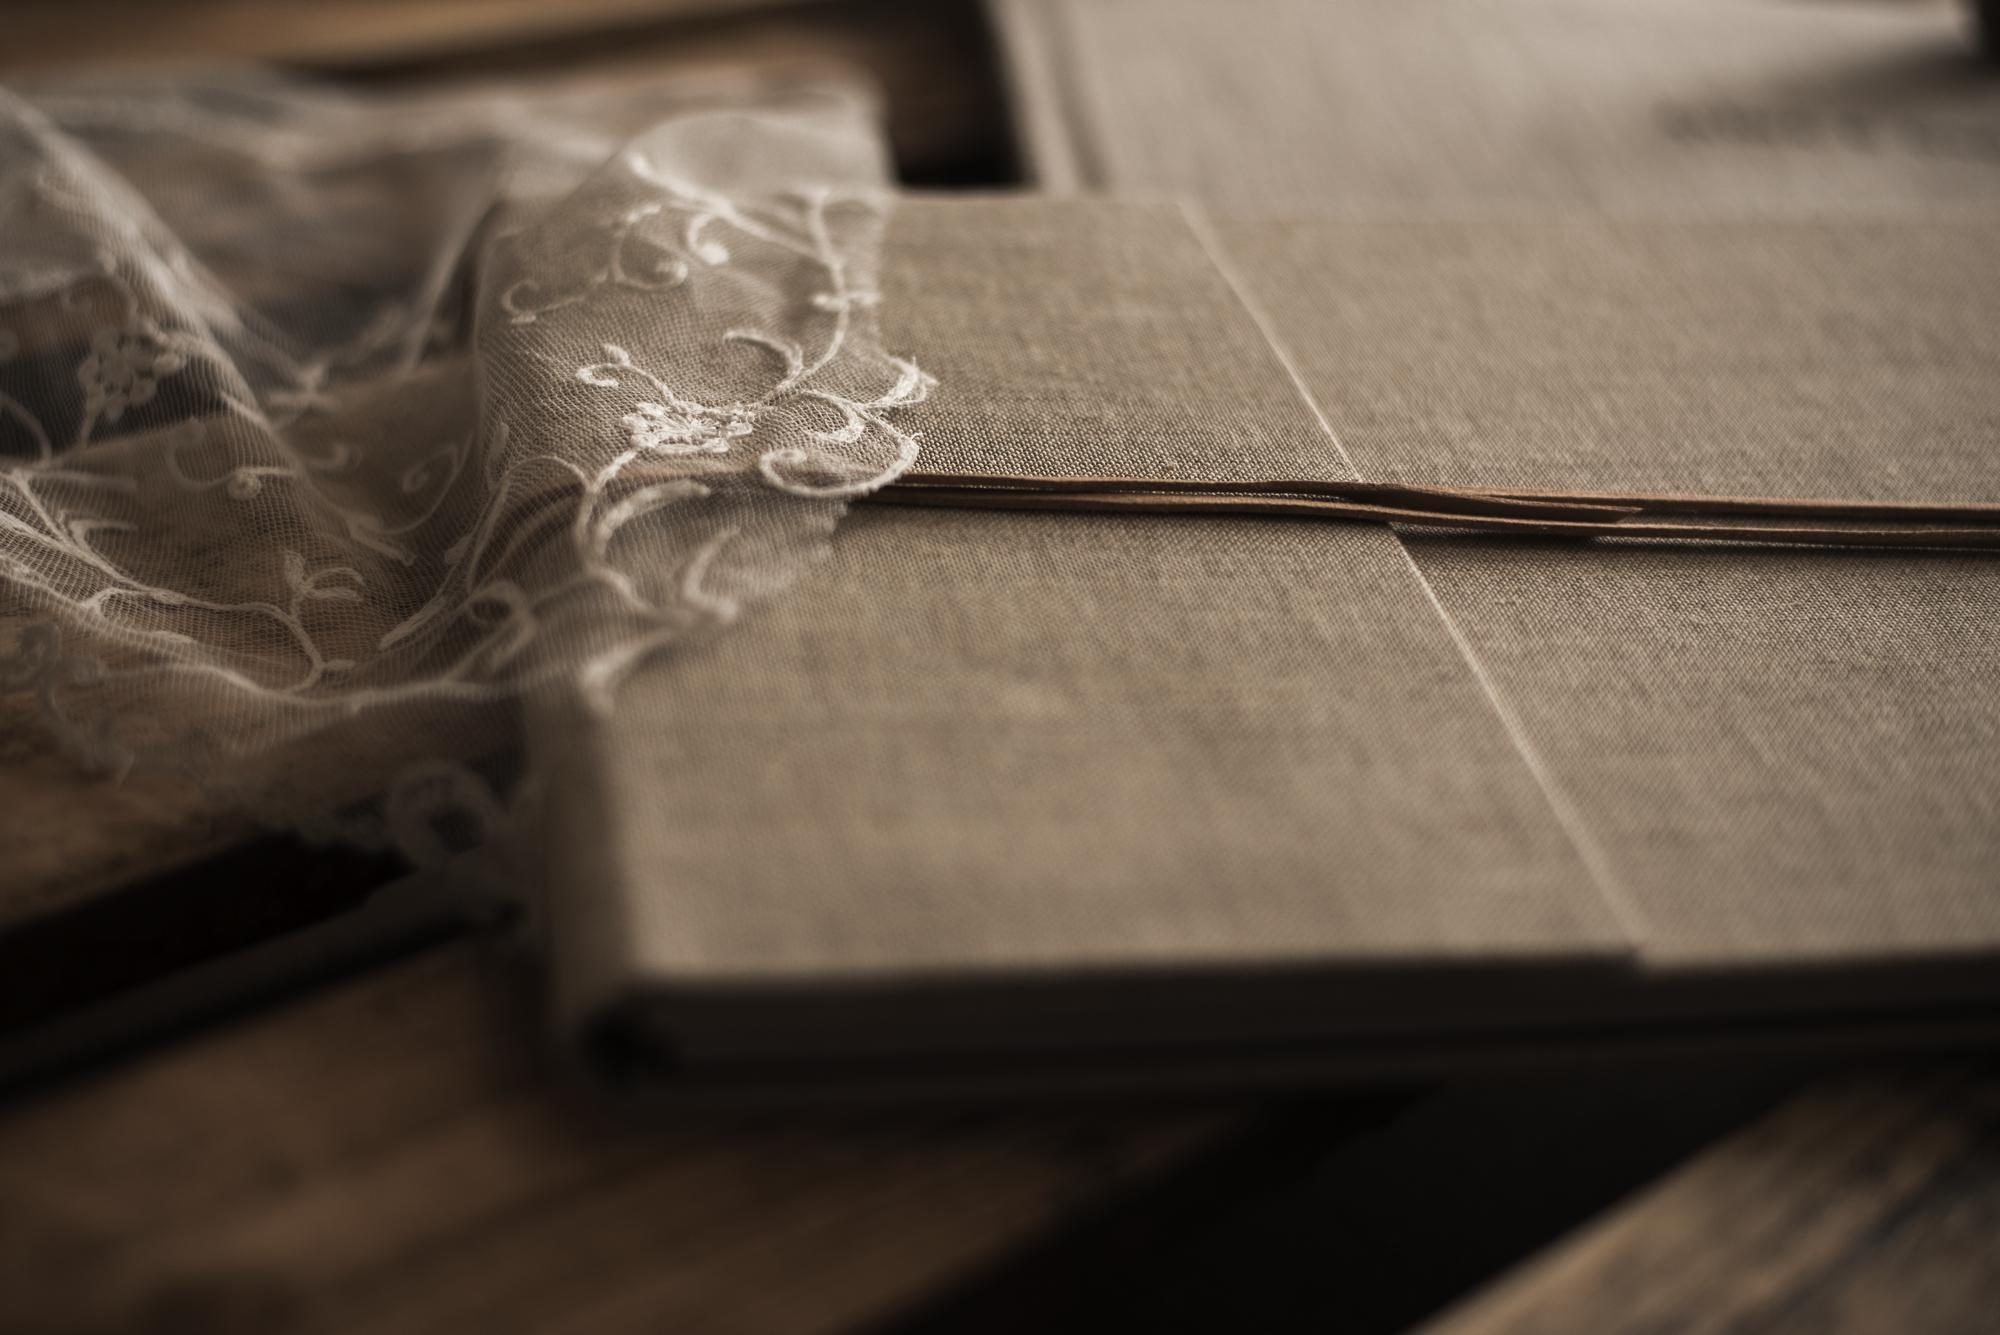 Solapa  lino avena con hilo de cuero